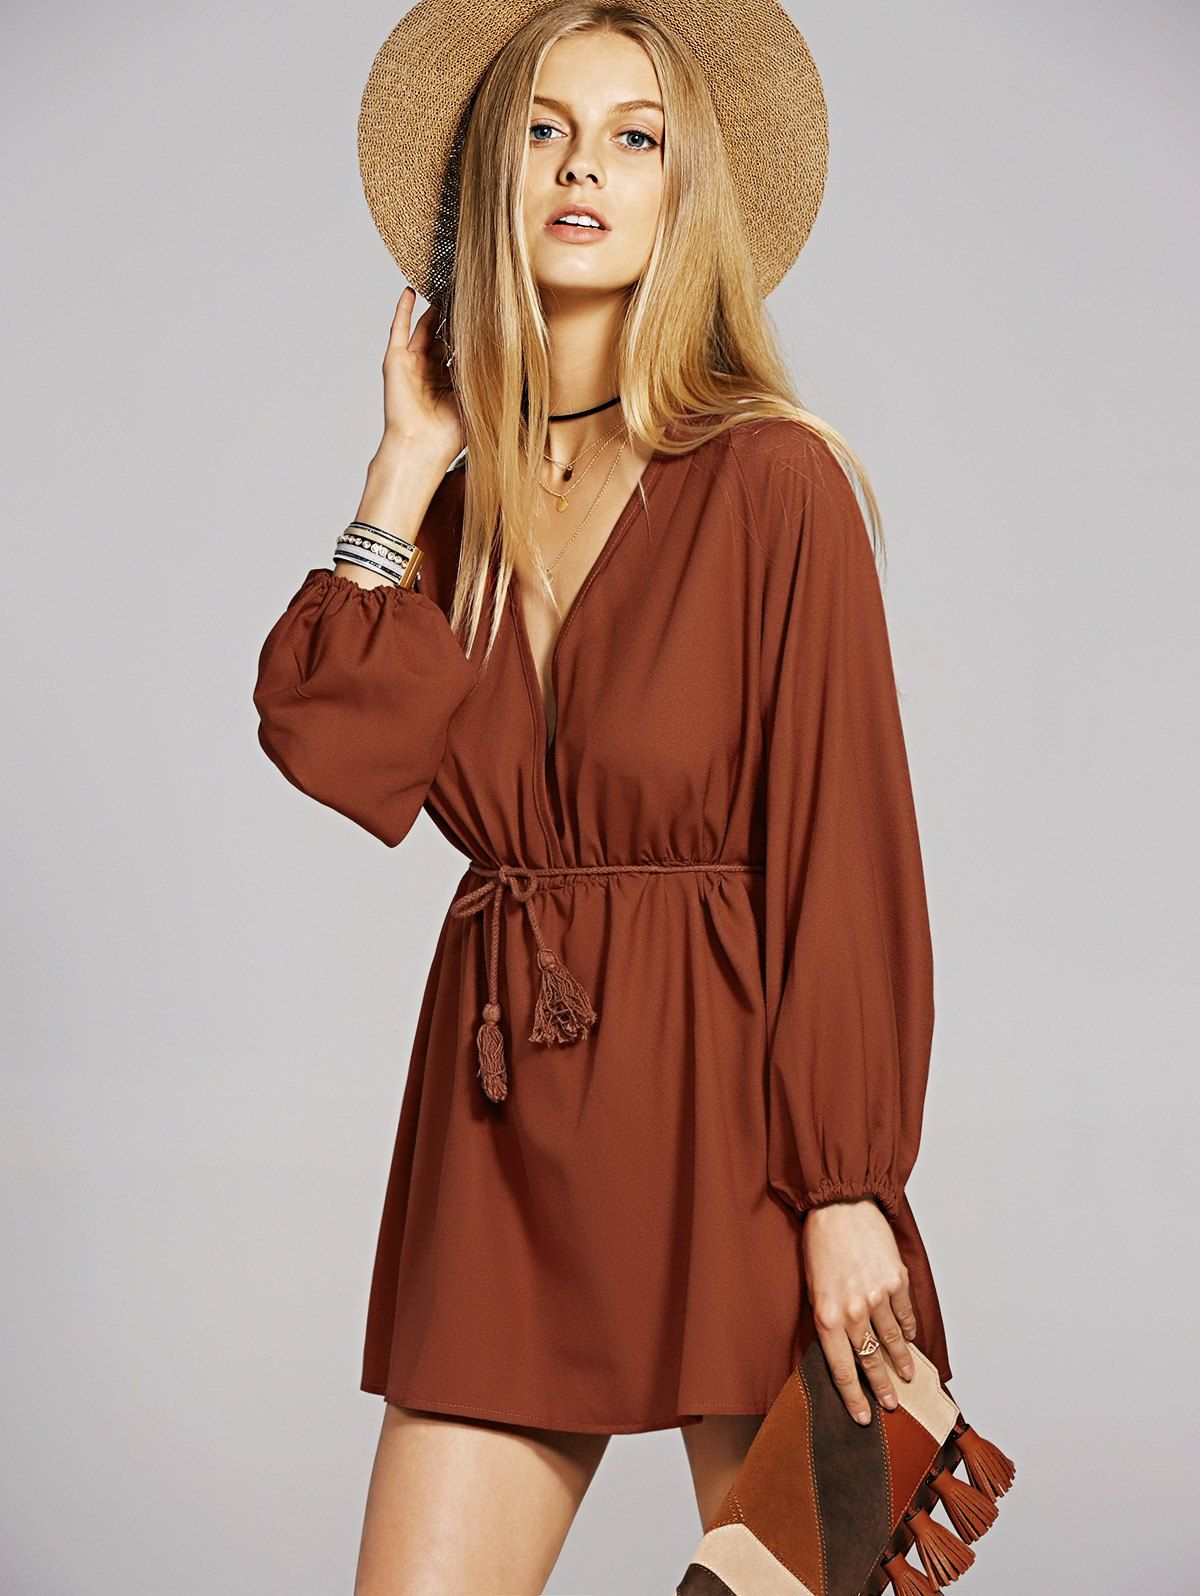 05e5b597f4 Bohemian Long Sleeve Plunging Neck A-Line Dress For Women   MINI ...